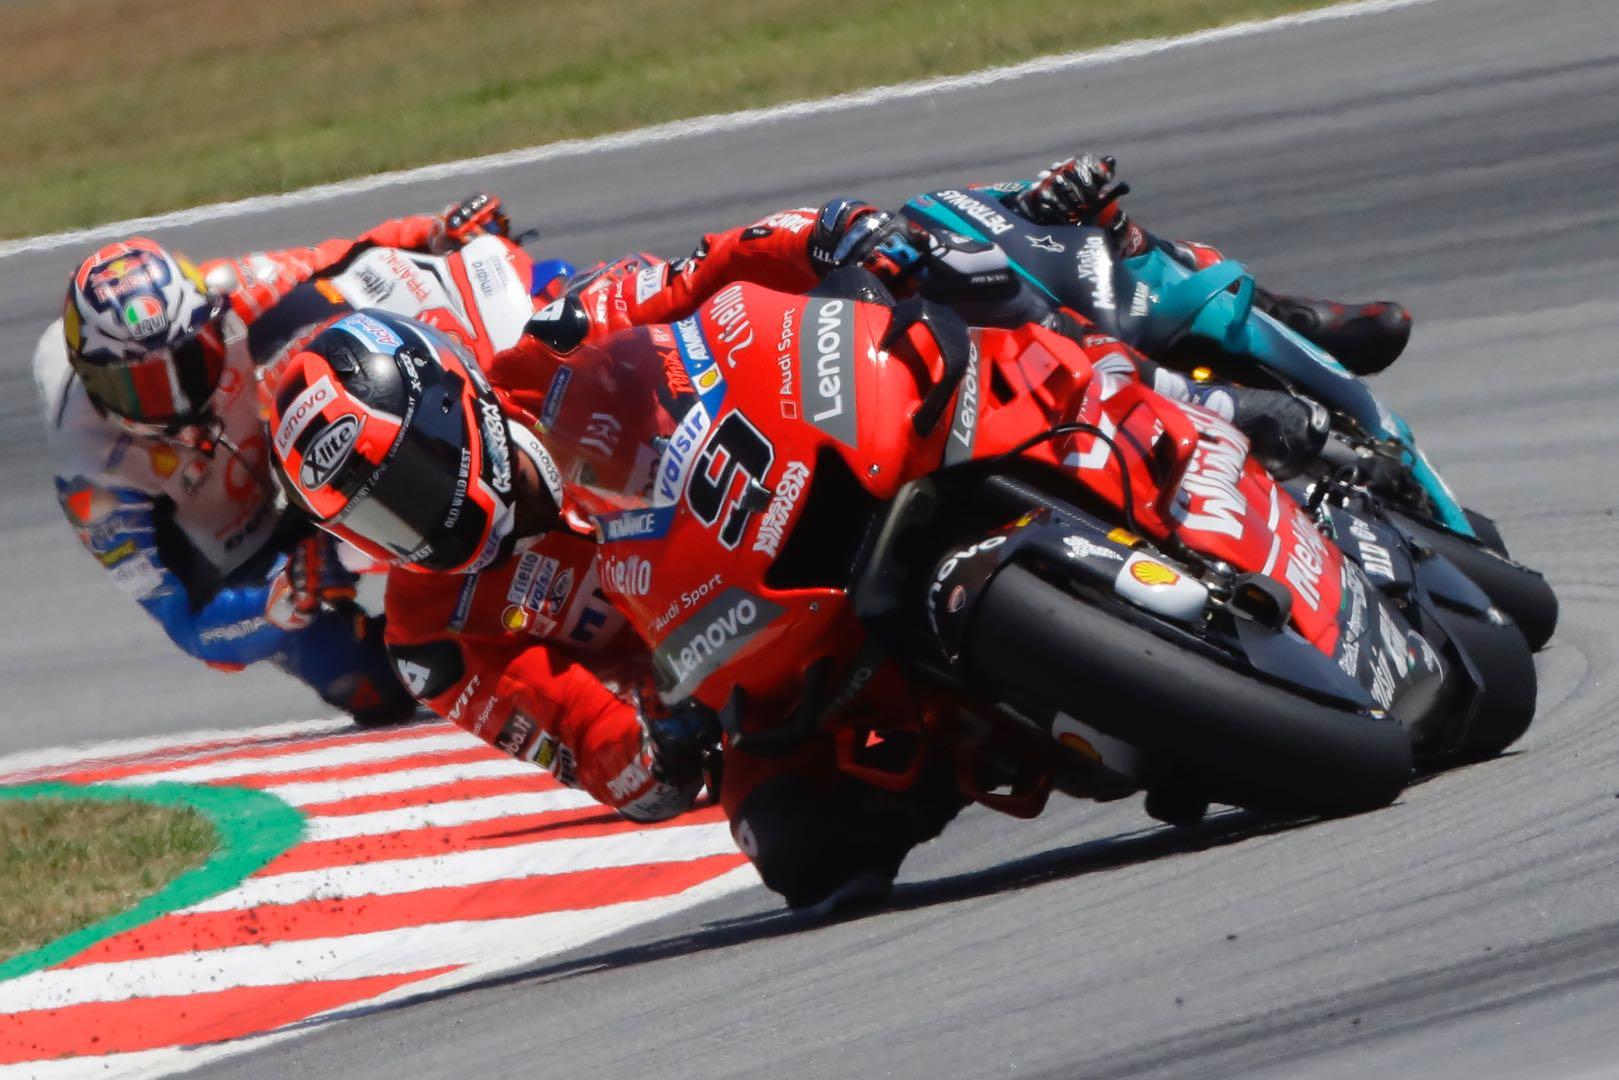 Ducati's Danilo Petrucci at Catalan MotoGP